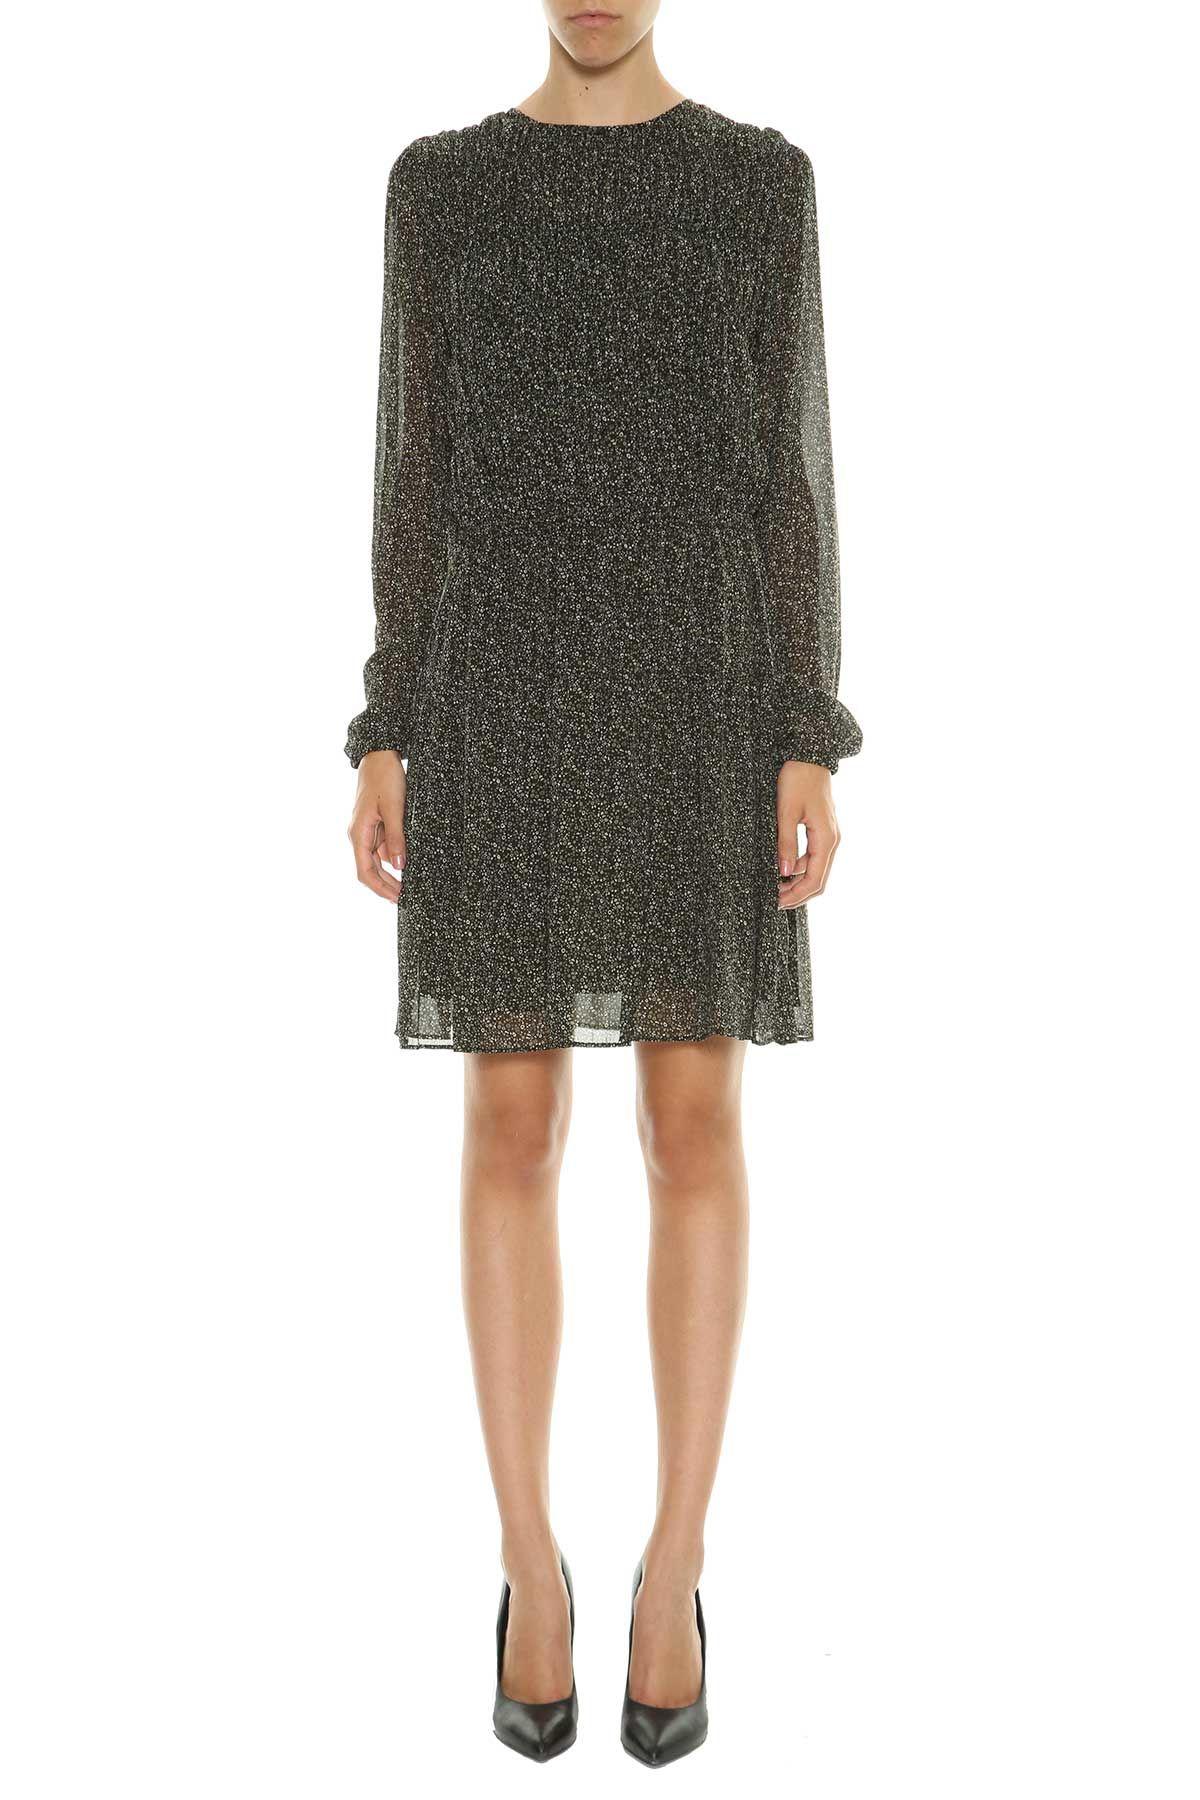 Michael Michael Kors Floral Printed Chiffon Short Dress